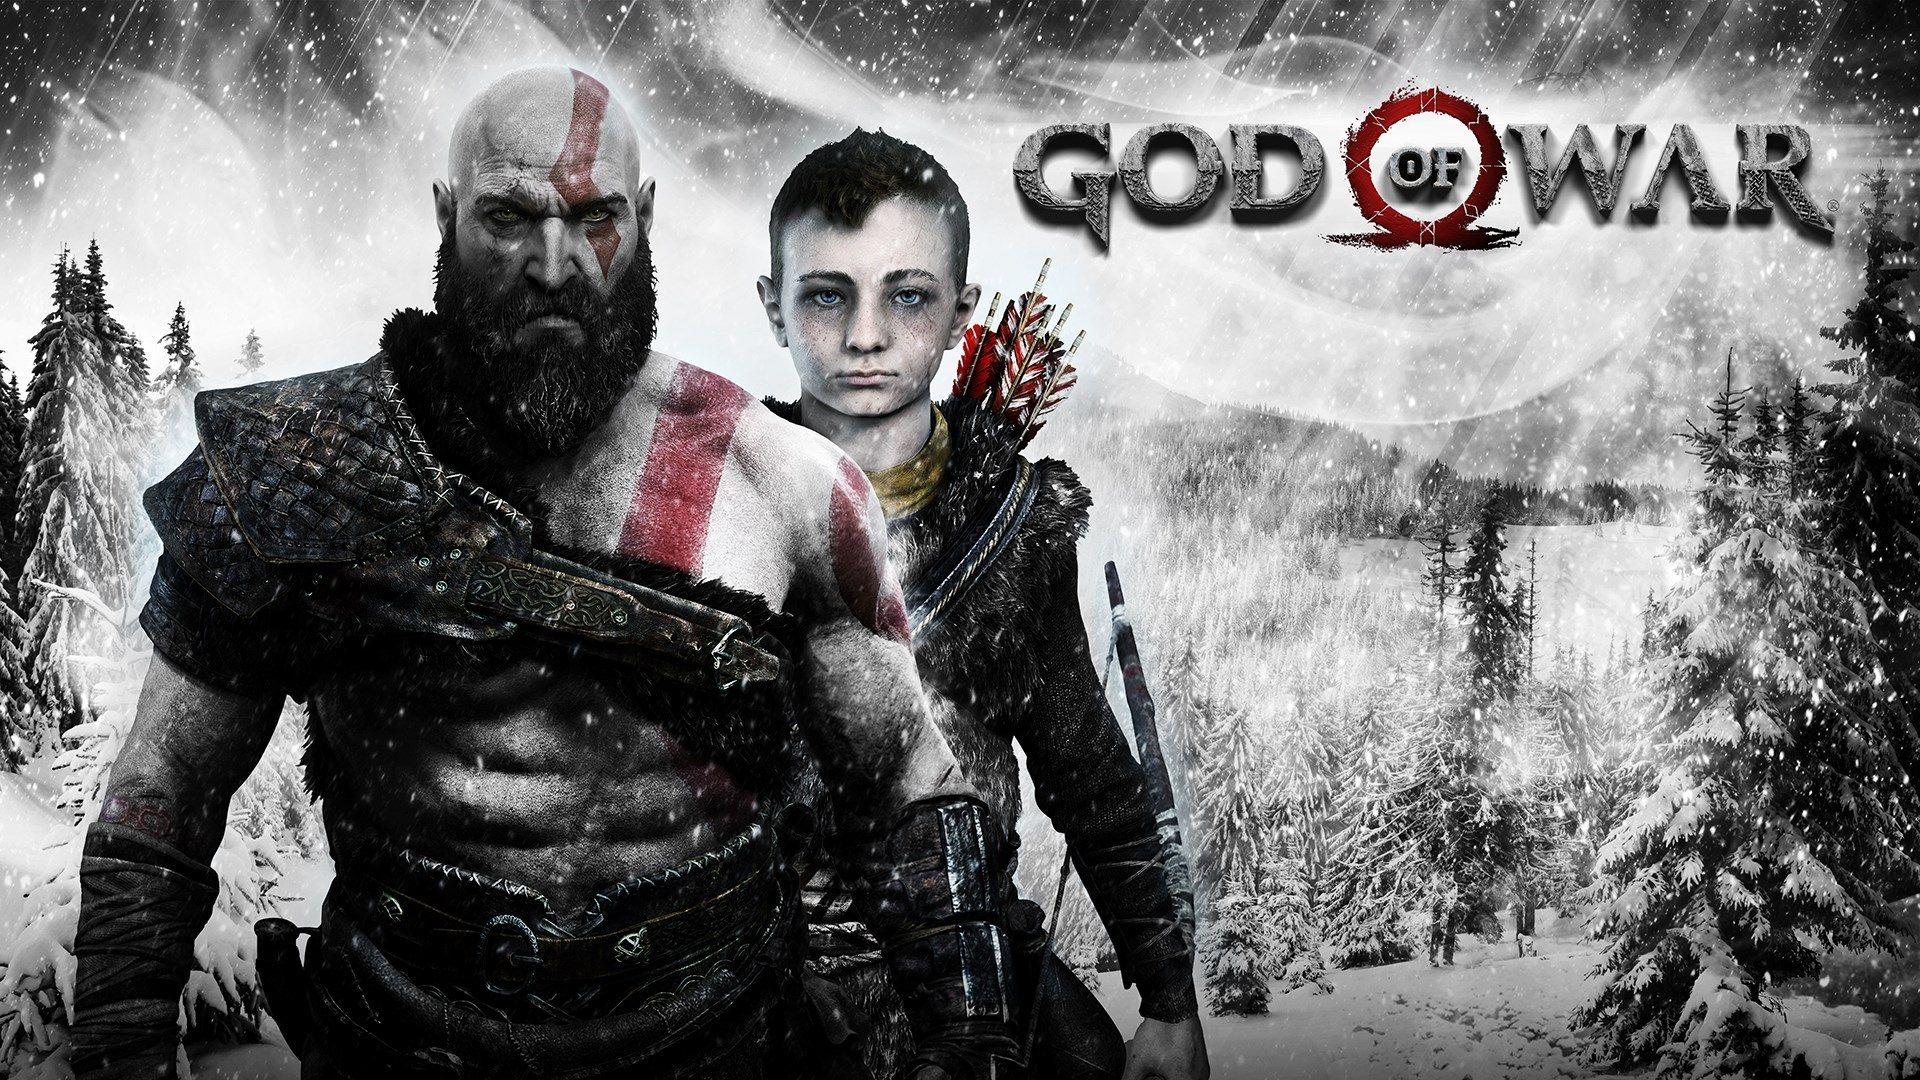 1920x1080 God Of War High Def Wallpaper For Mac God Of War Kratos God Of War God